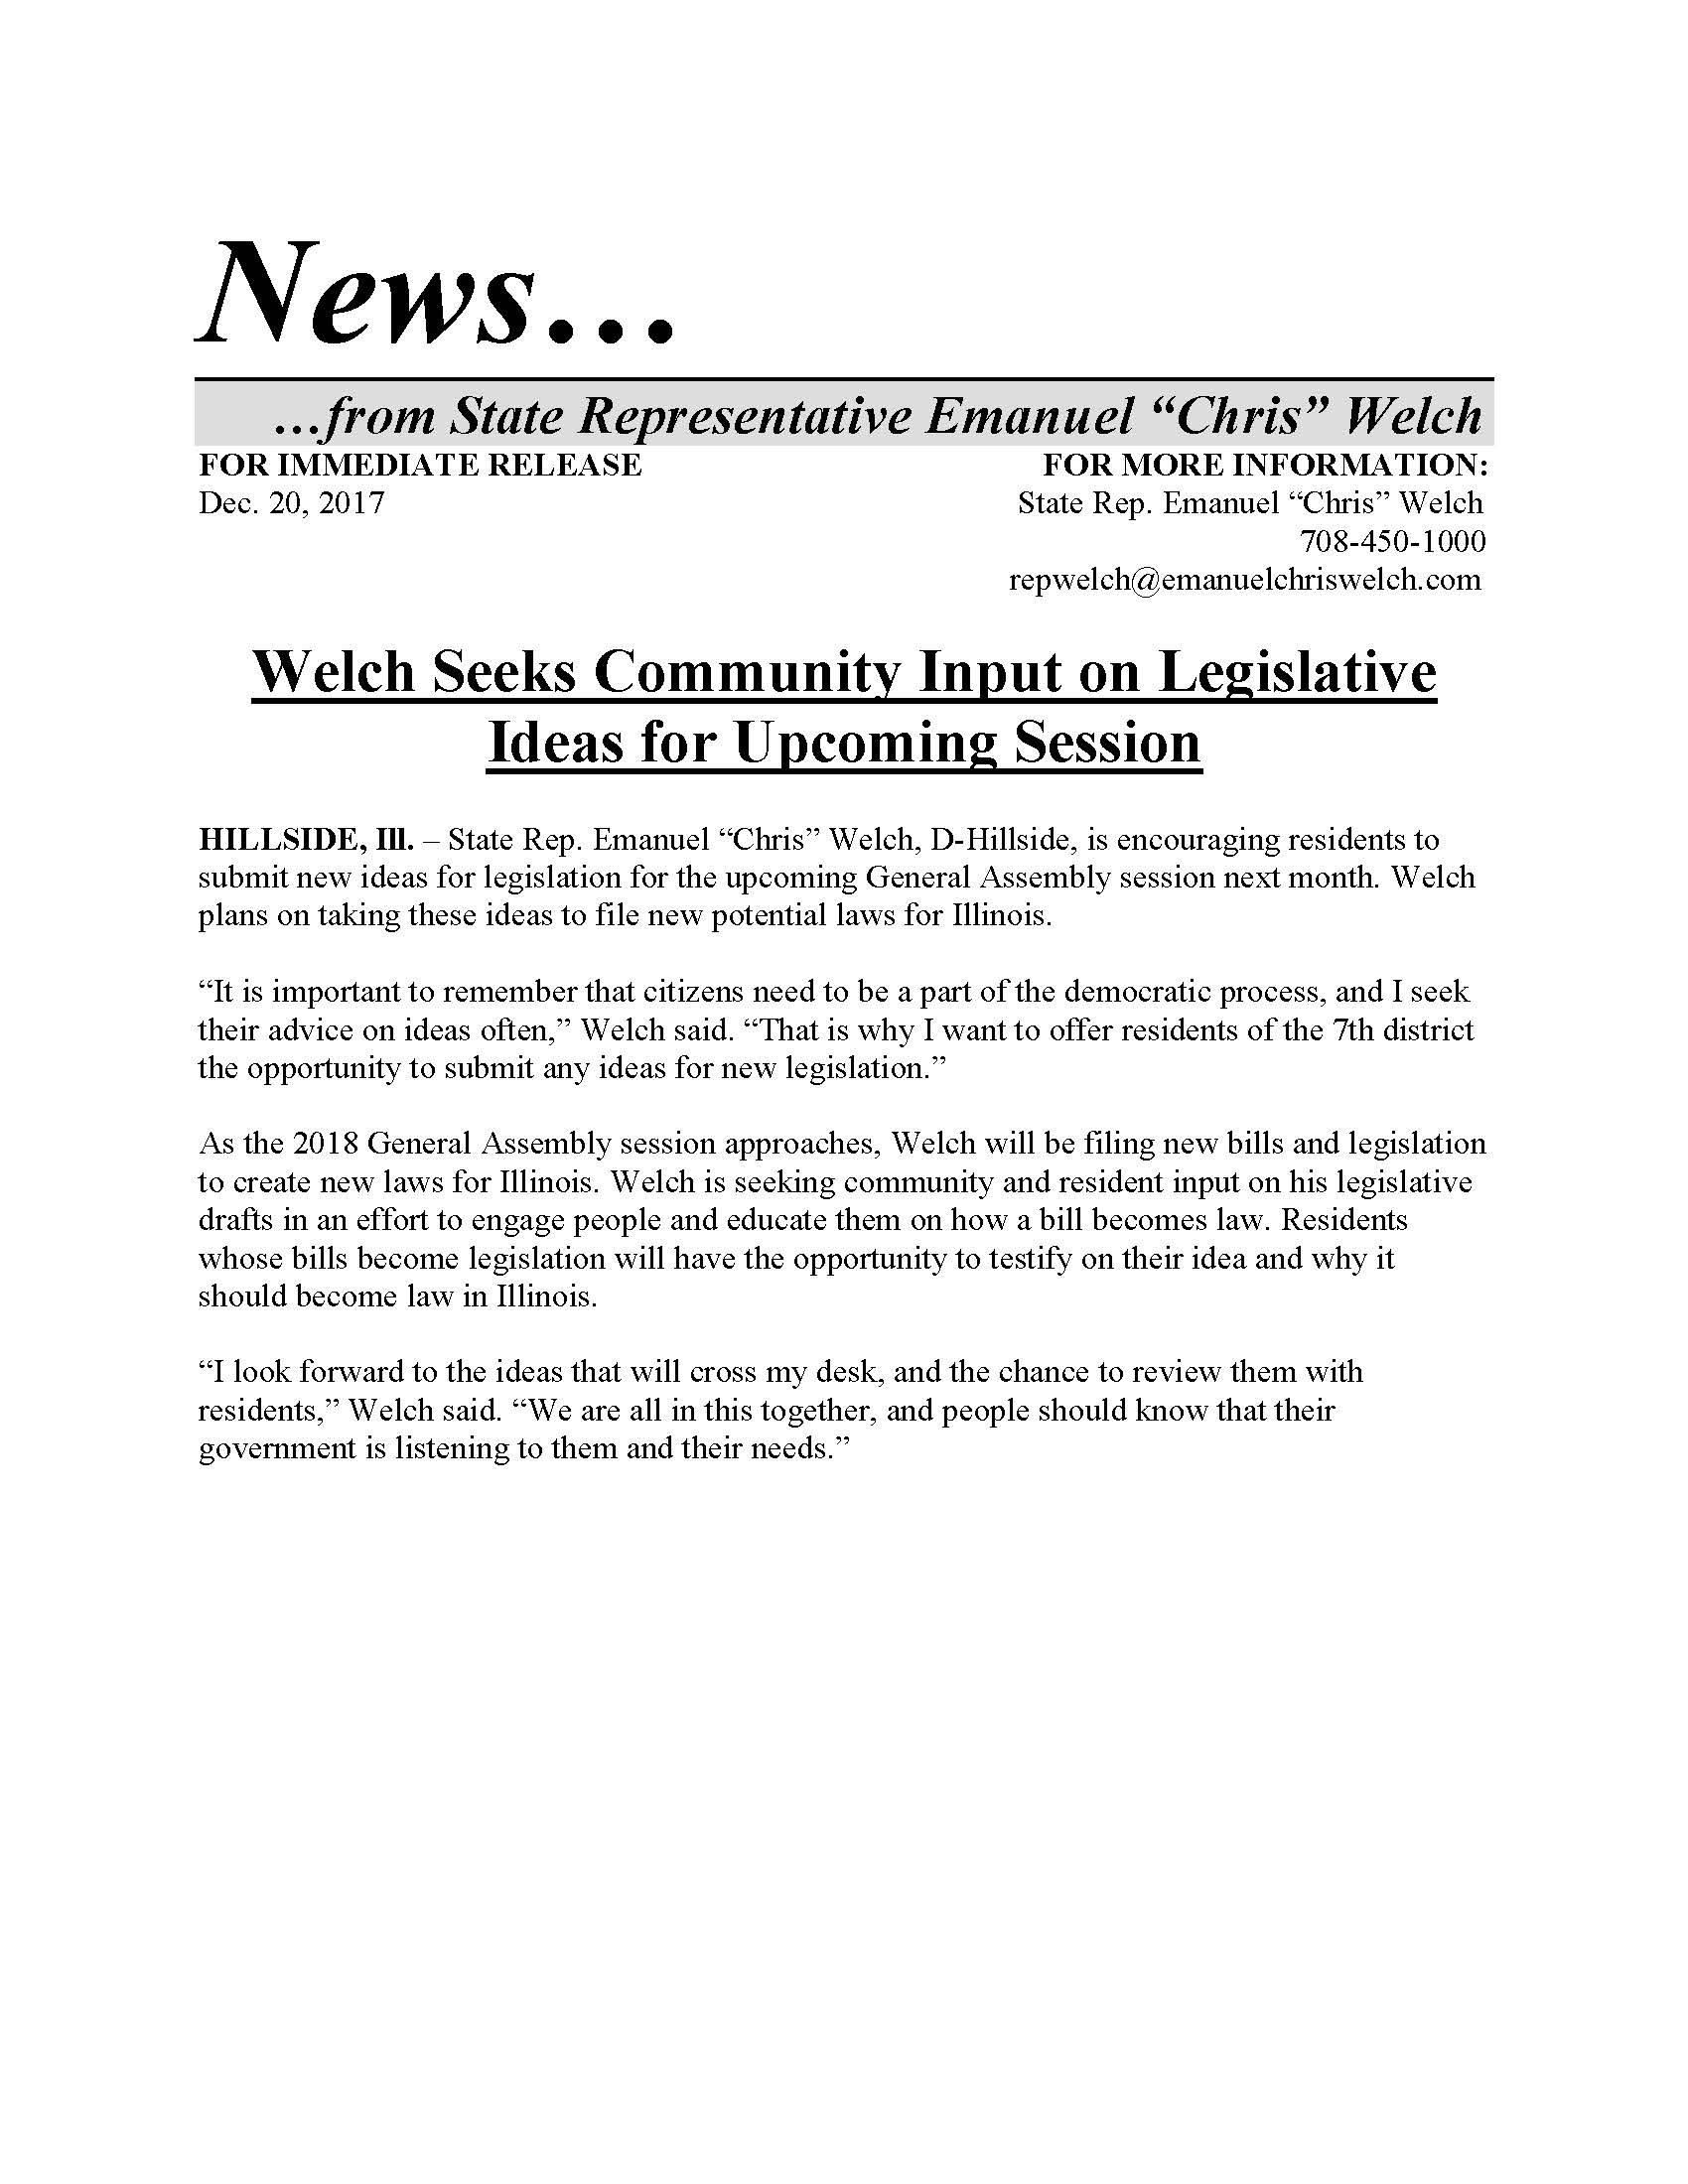 Welch Seeks Community Input on Legislative Ideas  (December 20, 2017)